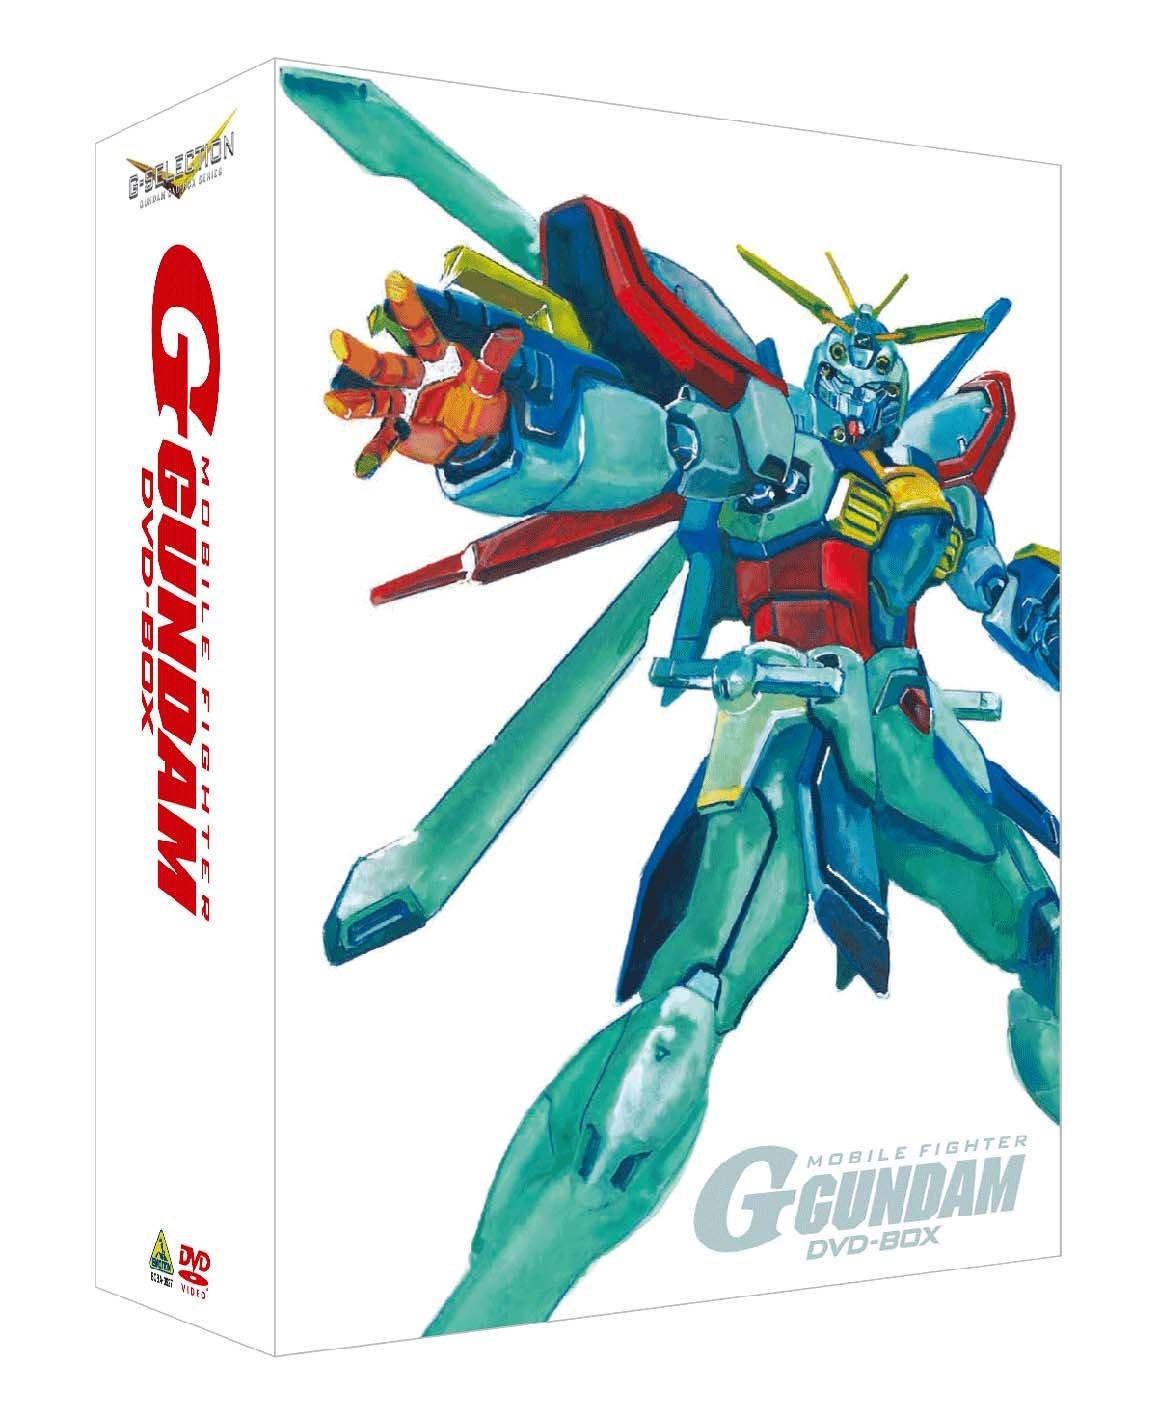 G-SELECTION 機動武闘伝Gガンダム DVD-BOX 【初回限定生産商品】 B003NVDMZI